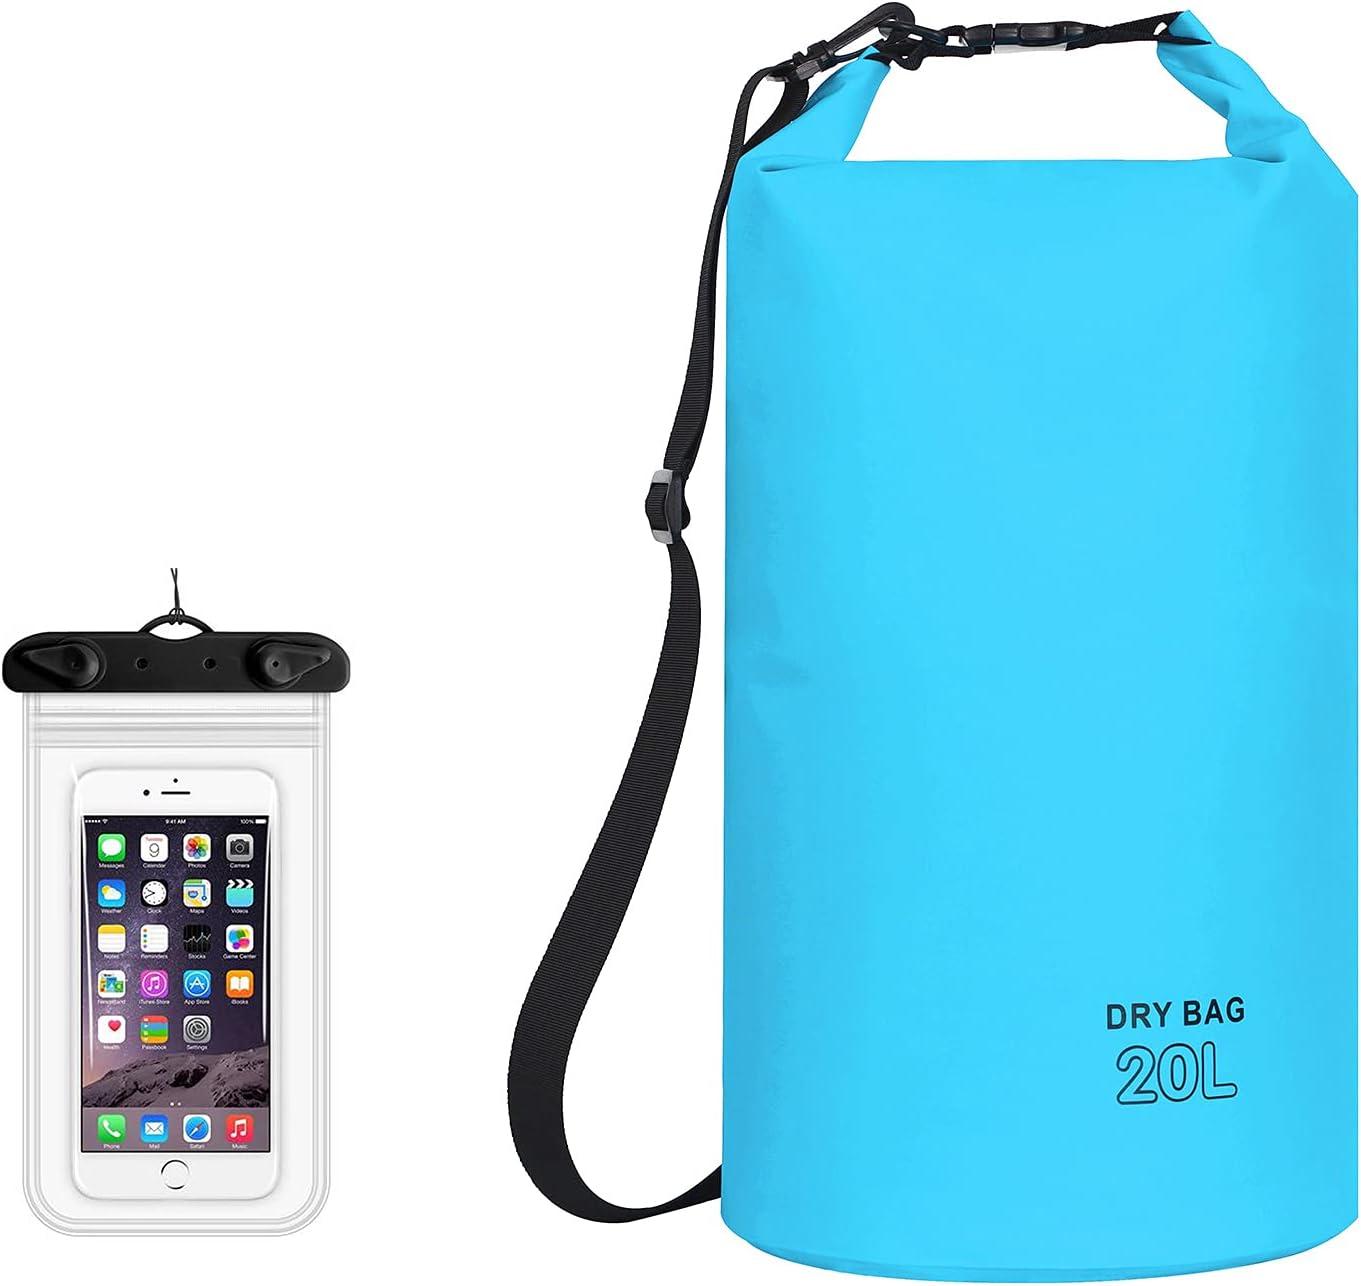 Heighco-Waterproof Sandproof Dry Bag for Max 60% OFF Top Men-Roll Women Max 45% OFF